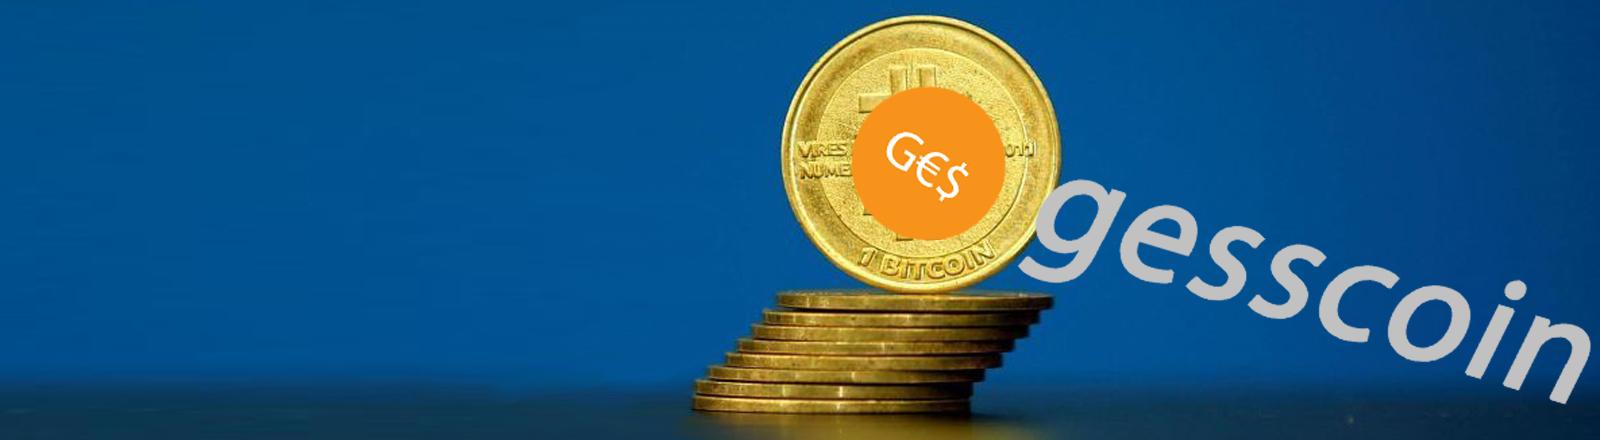 "Bildmontage: Bitcoin-Münze mit neuem Logo ""G€$"""